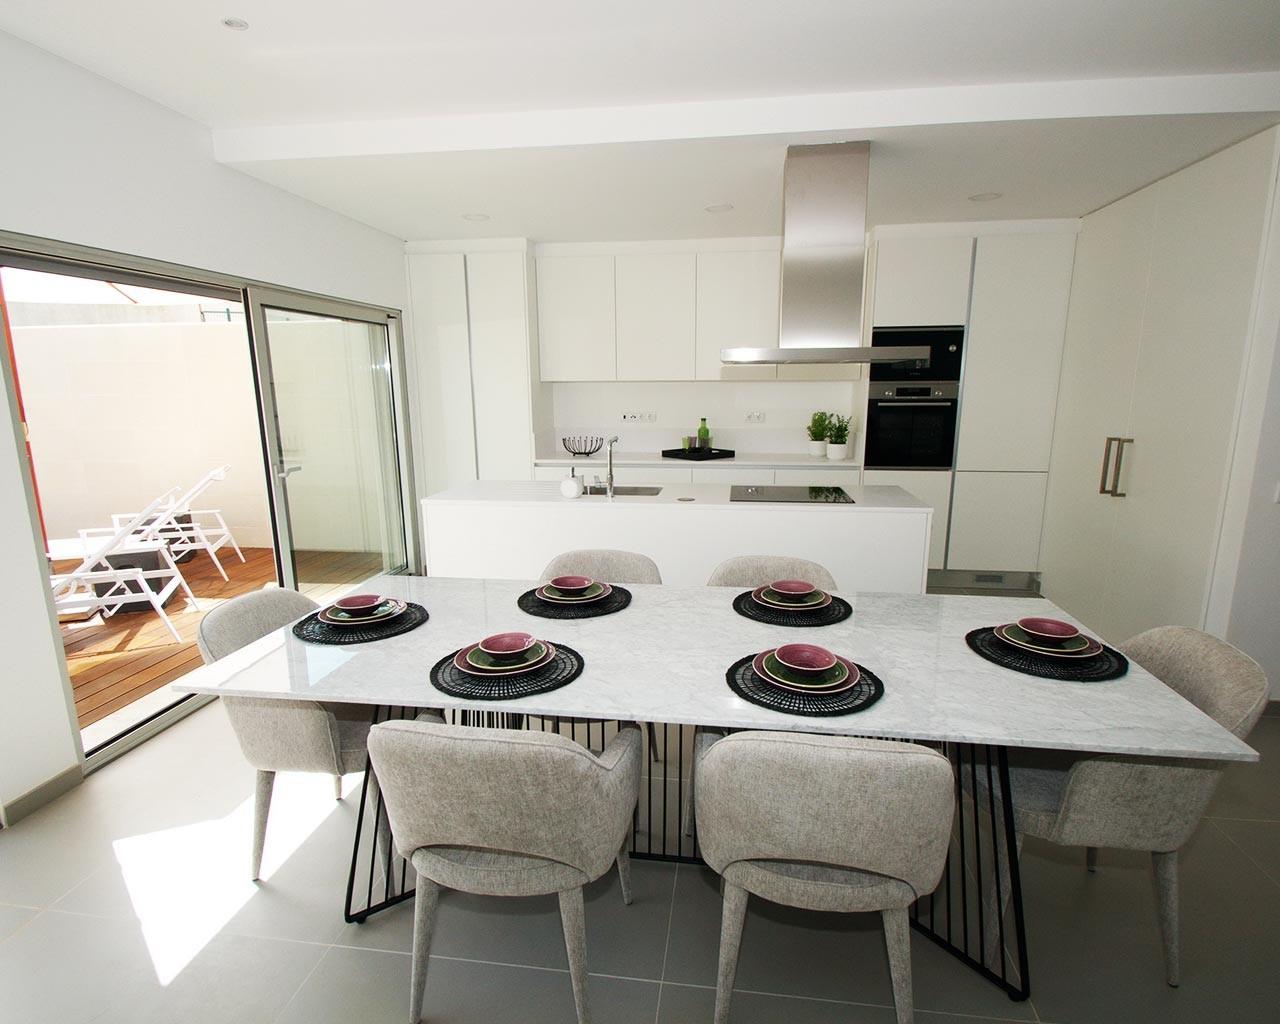 ferragudo-design-villas-cuisine-sala de jantar